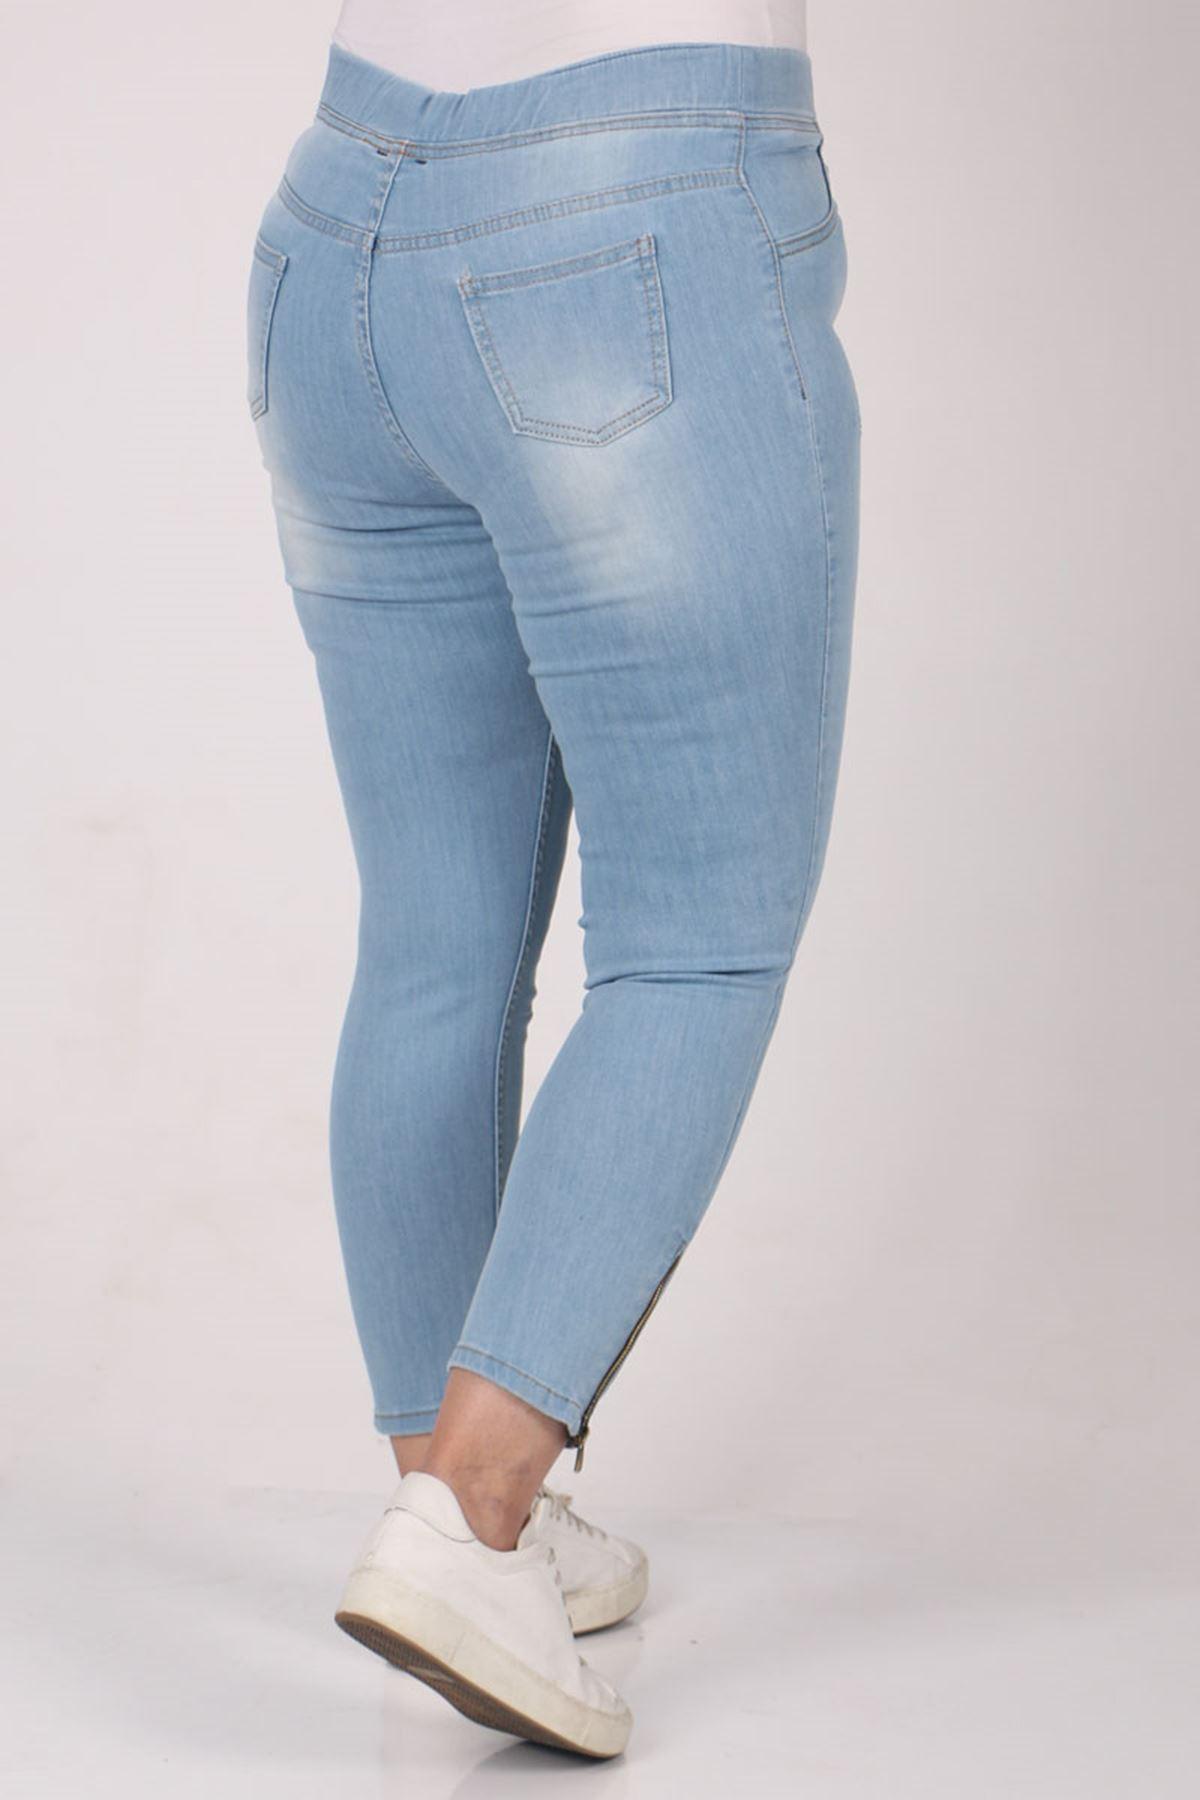 9121-2 Büyük Beden Beli Lastikli Dar Paça Kot Pantolon - Buz Mavi